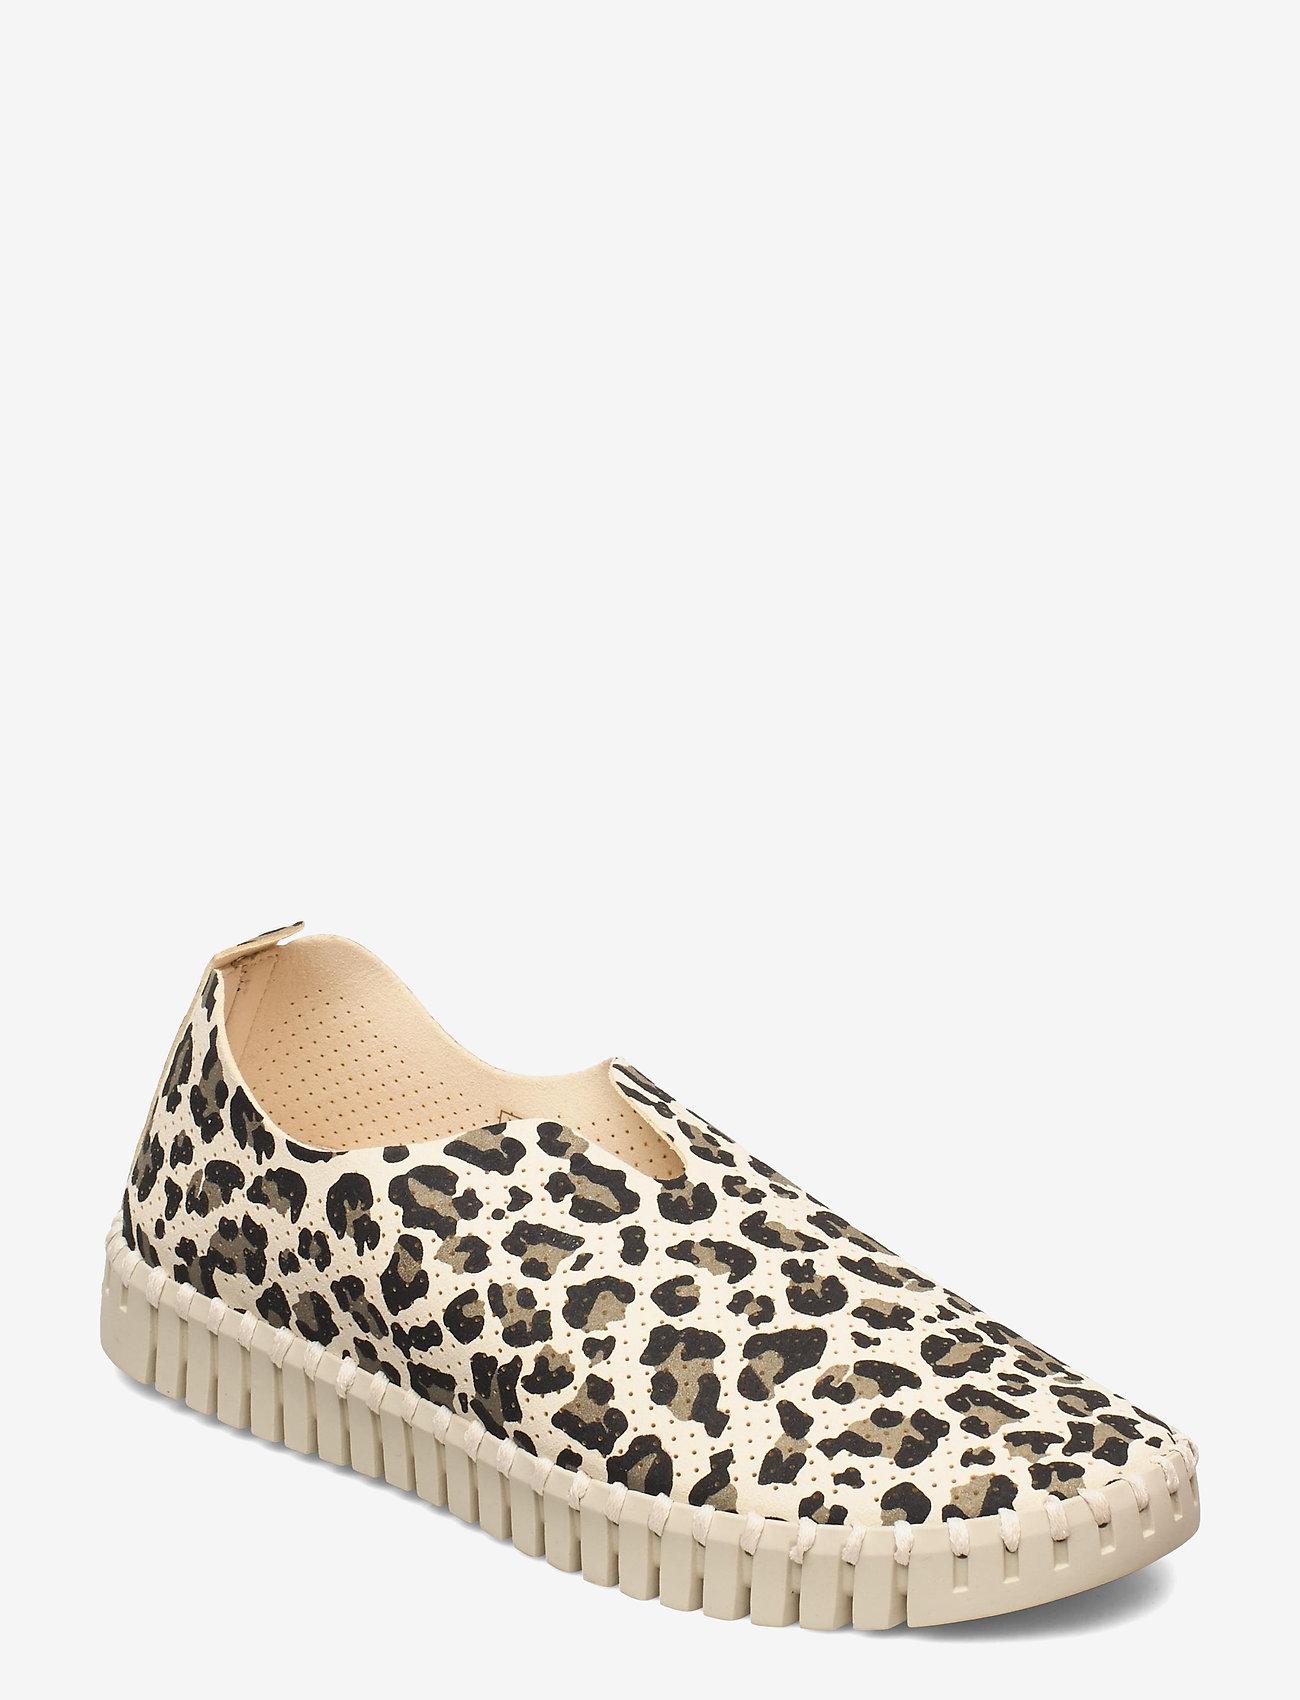 Ilse Jacobsen - Flats - slip-on sneakers - milk creme - 0